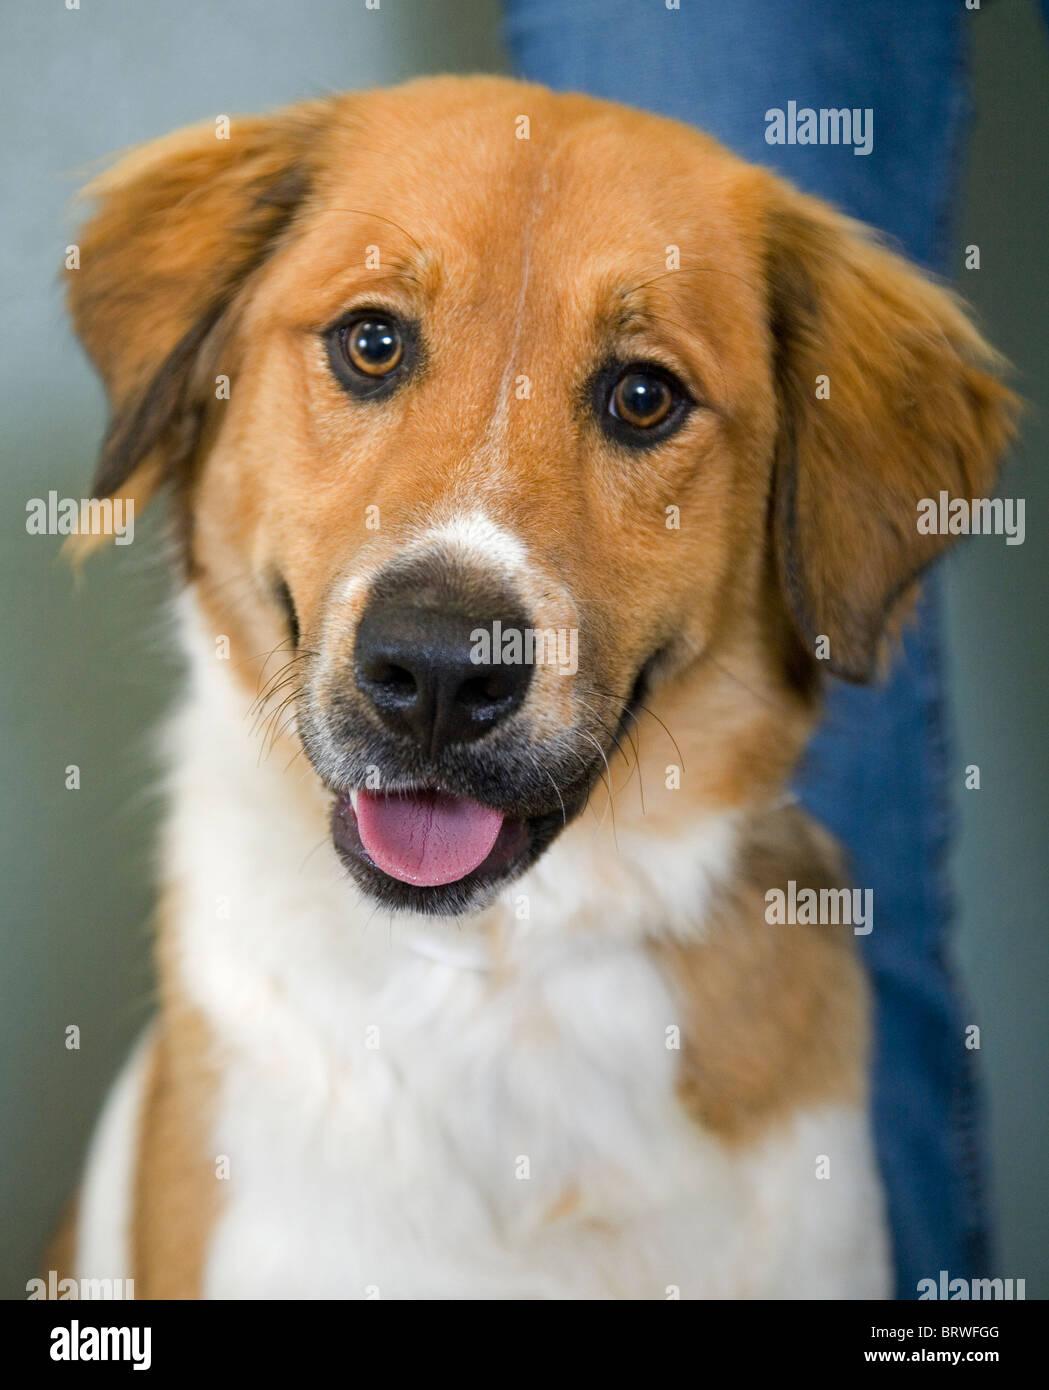 Portrait of a friendly dog, man's best friend - Stock Image